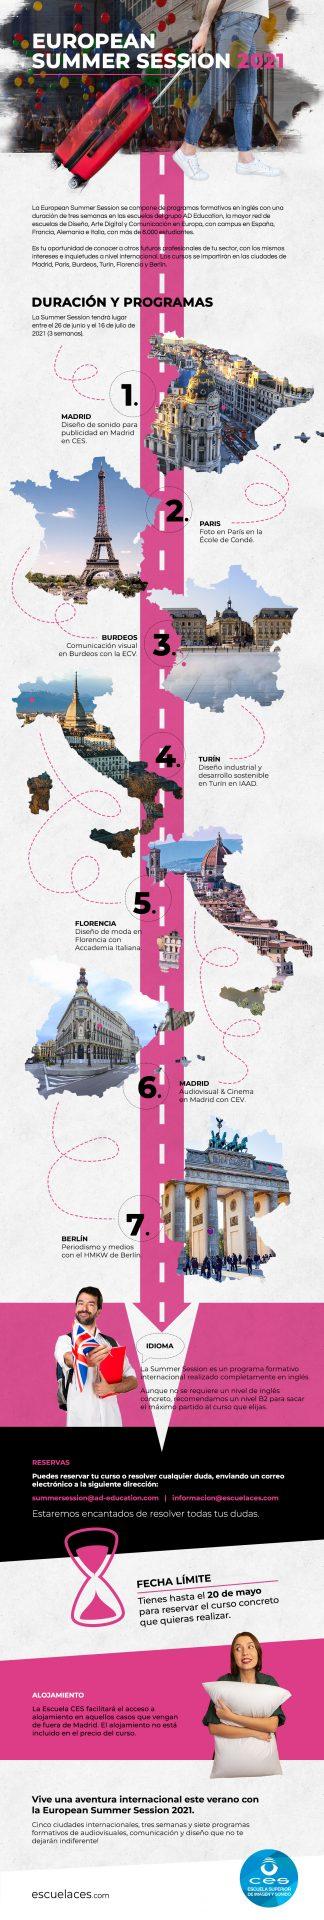 Cursos de Verano – European Summer Session 2021